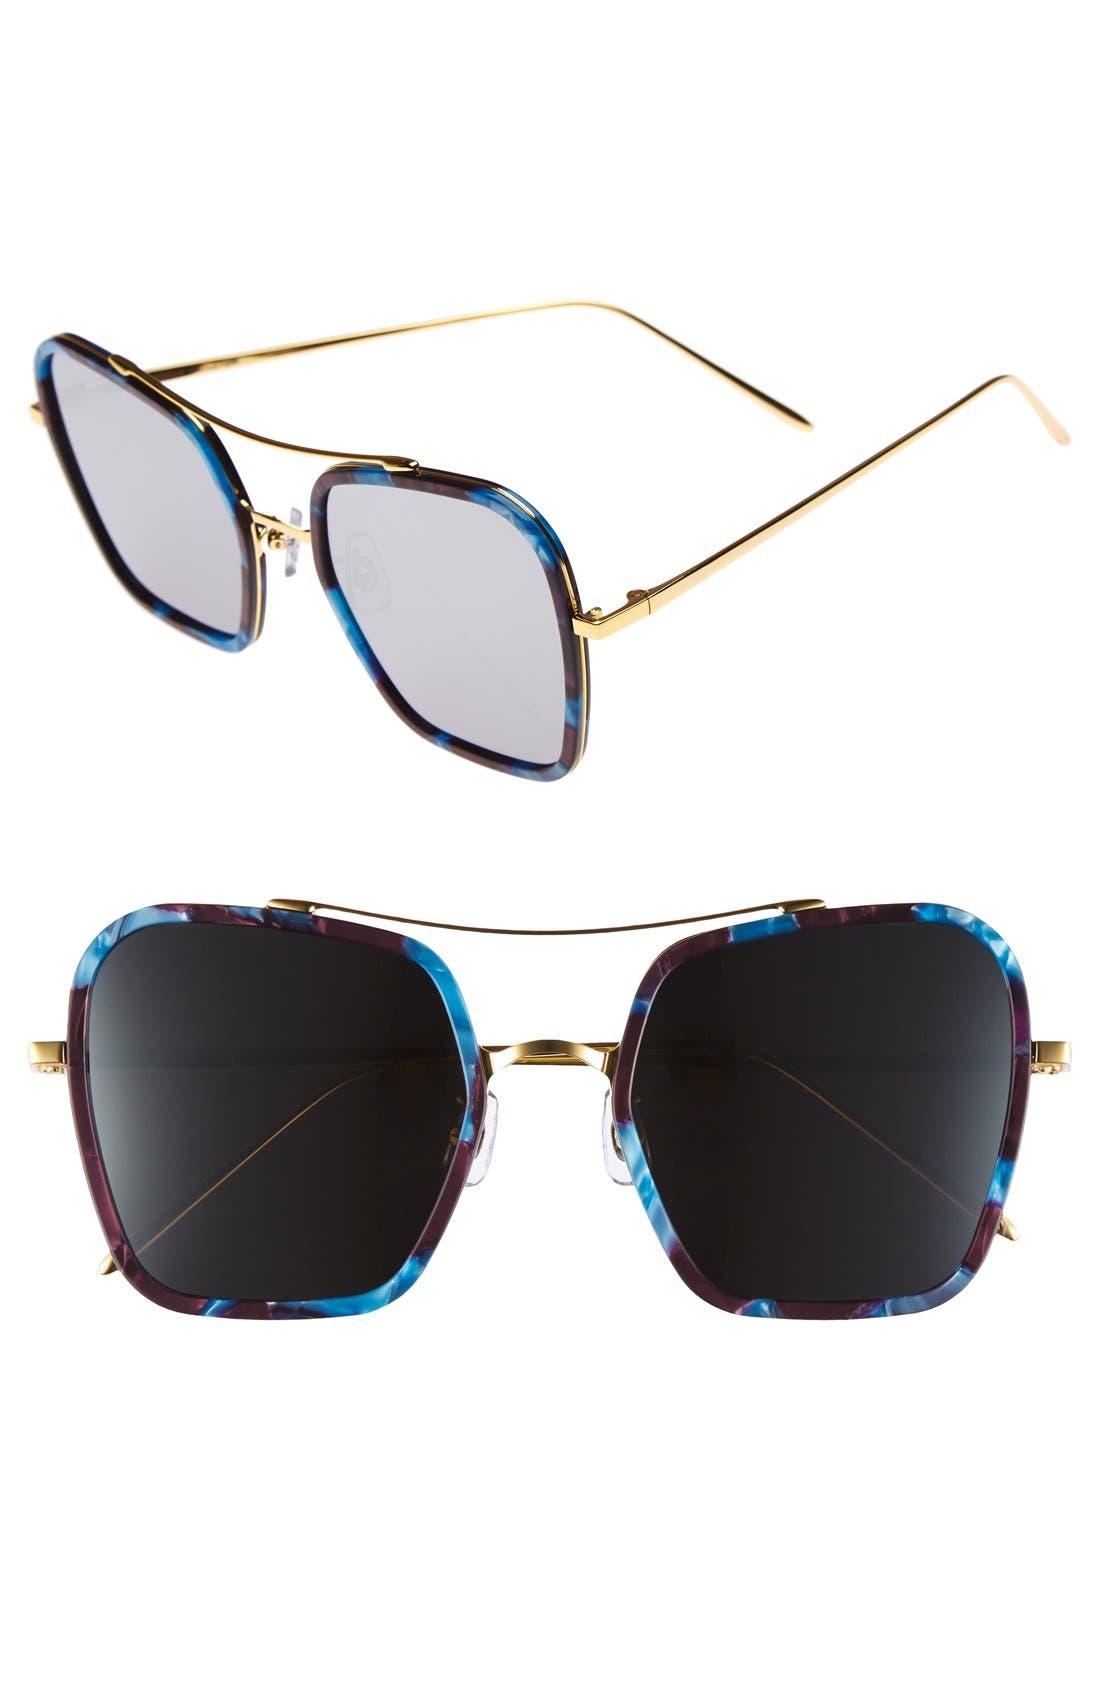 53mm Retro Square Sunglasses,                             Main thumbnail 3, color,